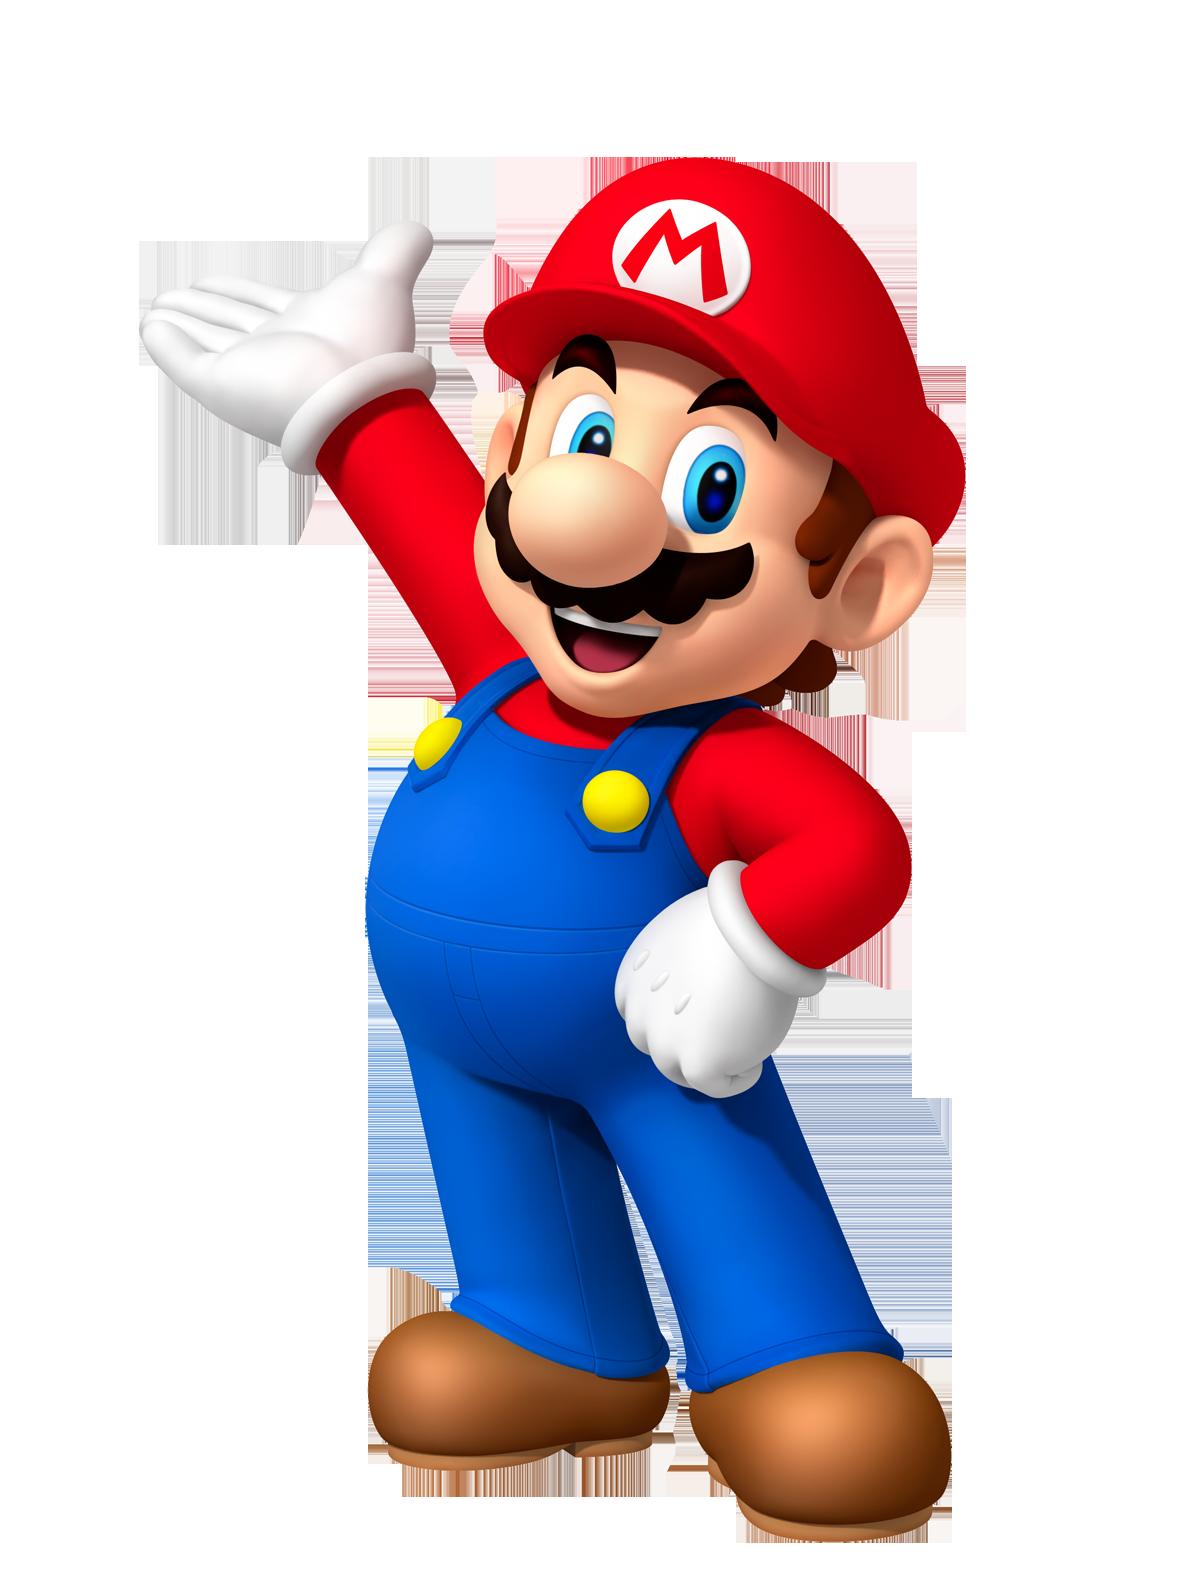 Retromags On Twitter Super Mario Sunshine Super Mario Bros Party Mario Bros Party